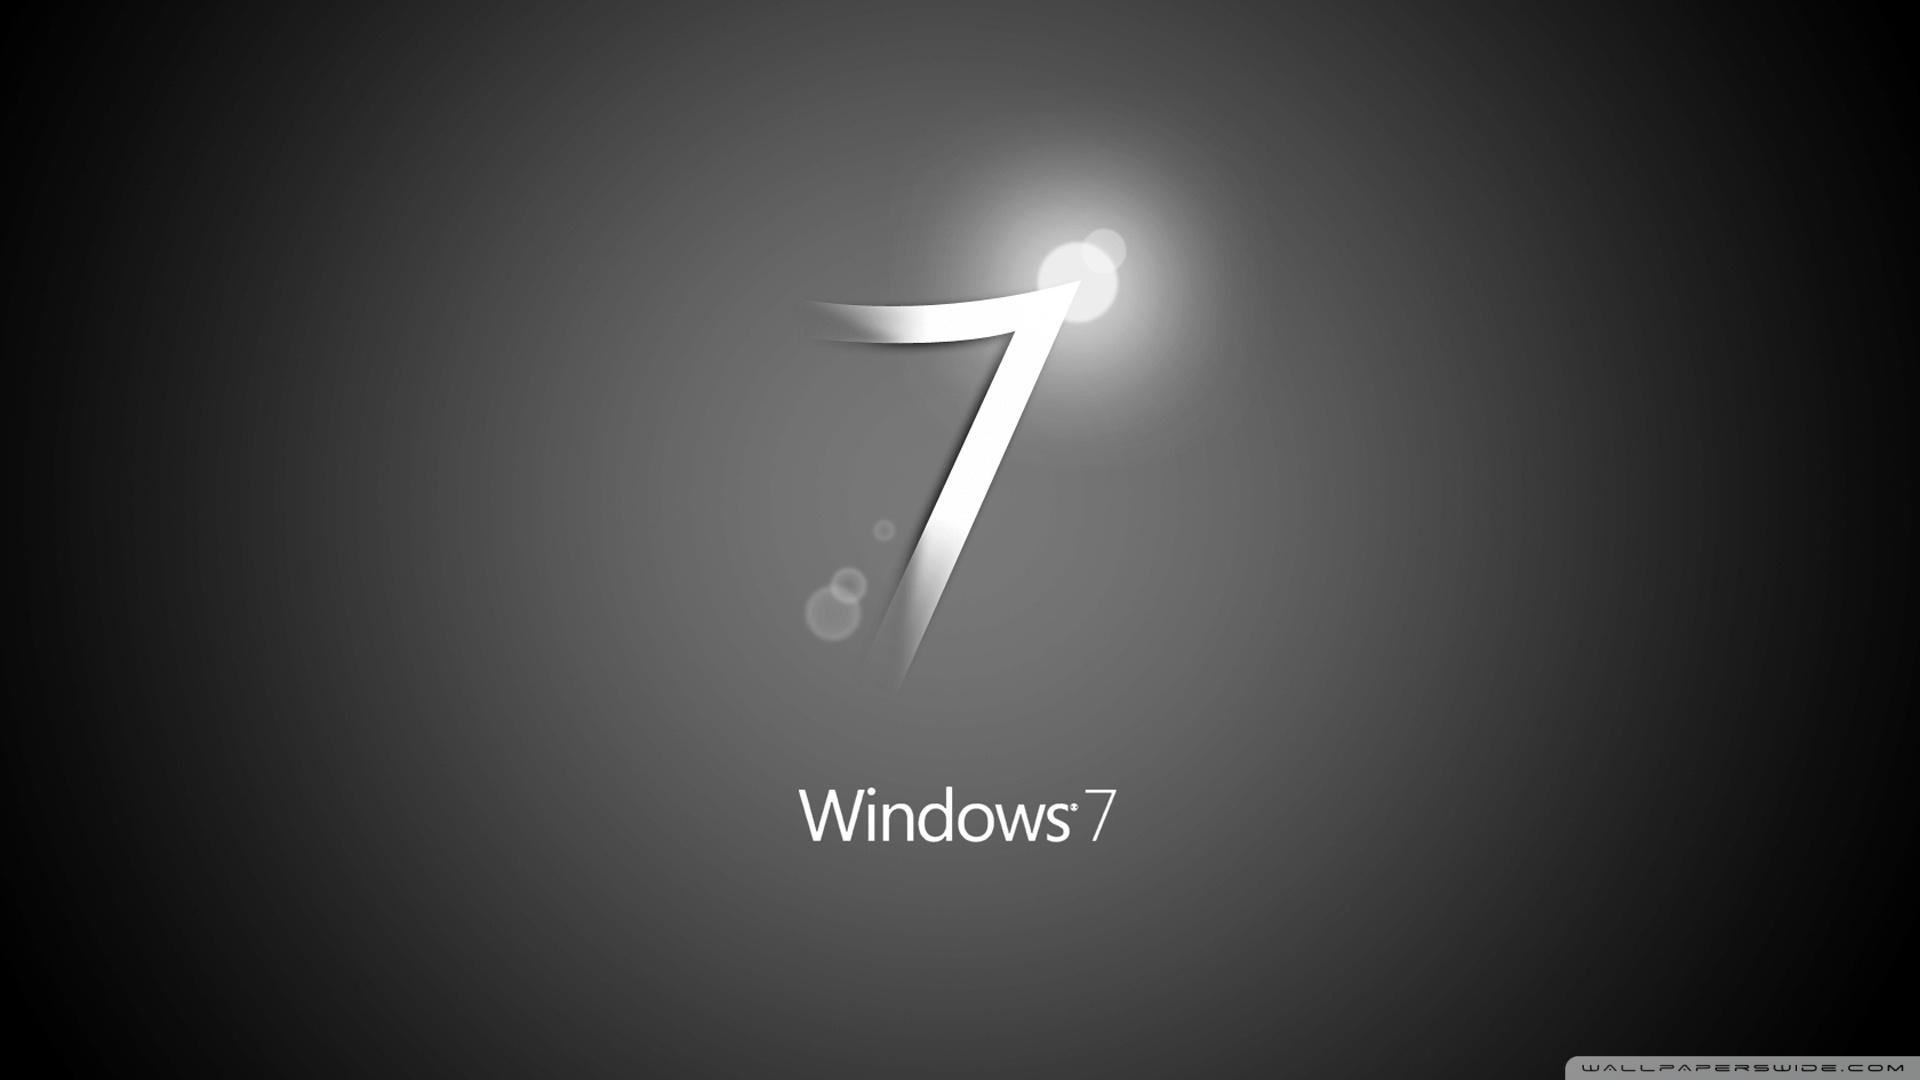 Download windows seven black 1024x768 wallpaper 1771 - Windows 7 Black Wallpaper 1920x1080 Windows 7 Black